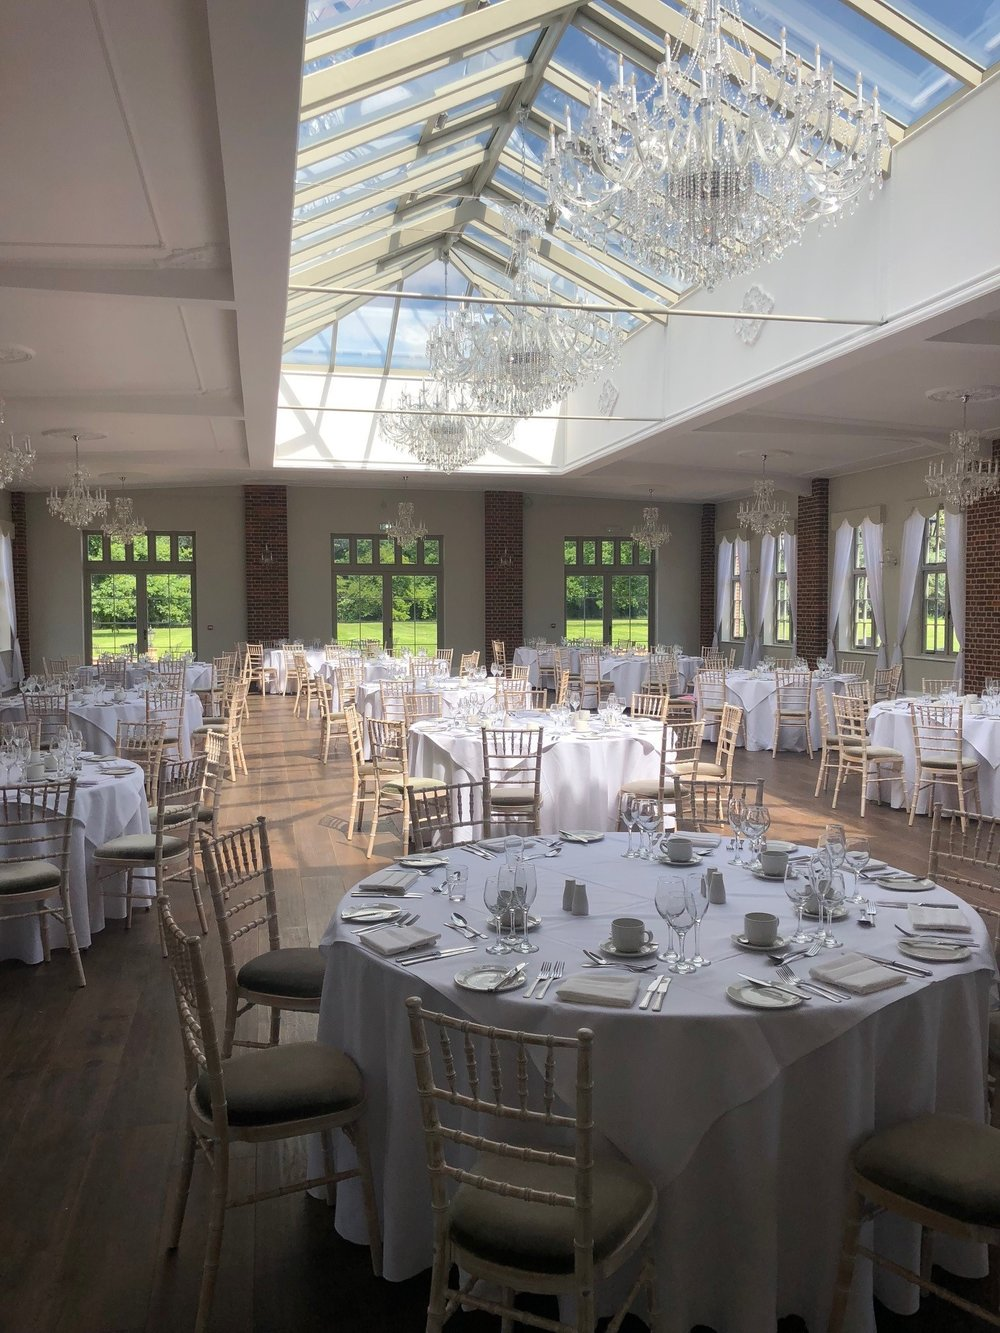 Wedding Breakfast chandeliers 120 guests.jpg